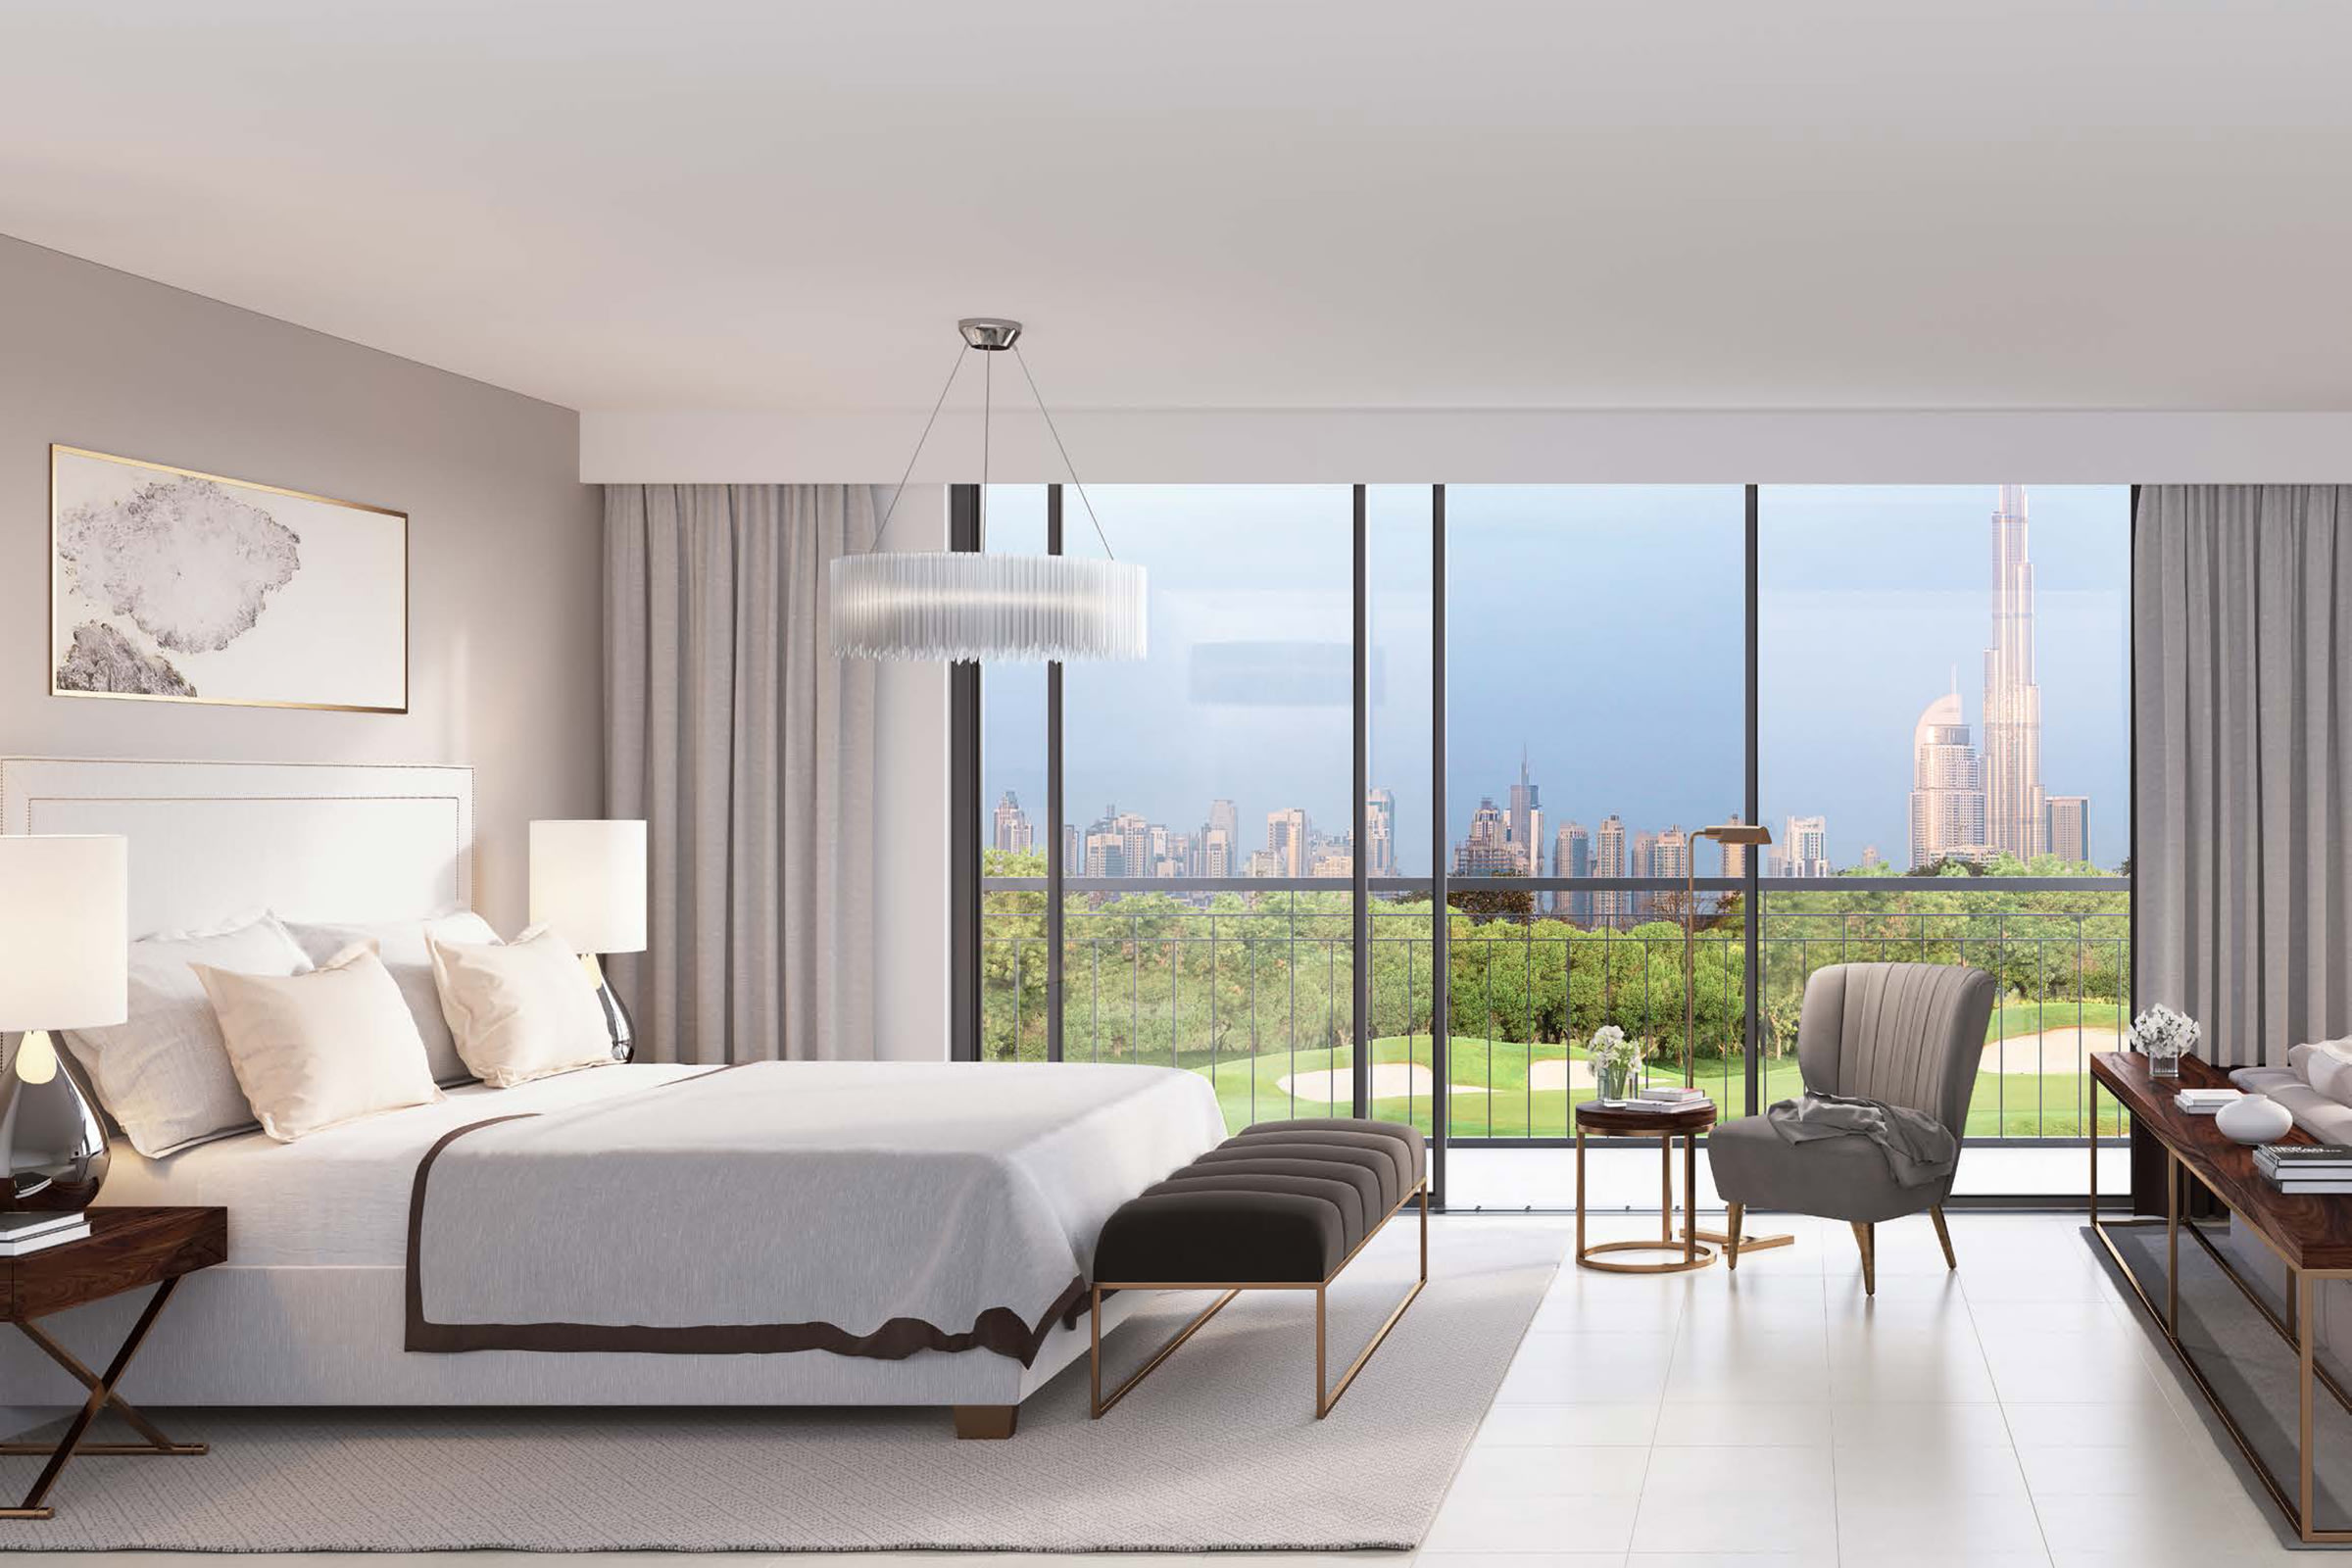 Stunning Modern Property Overlooking the Huge Park